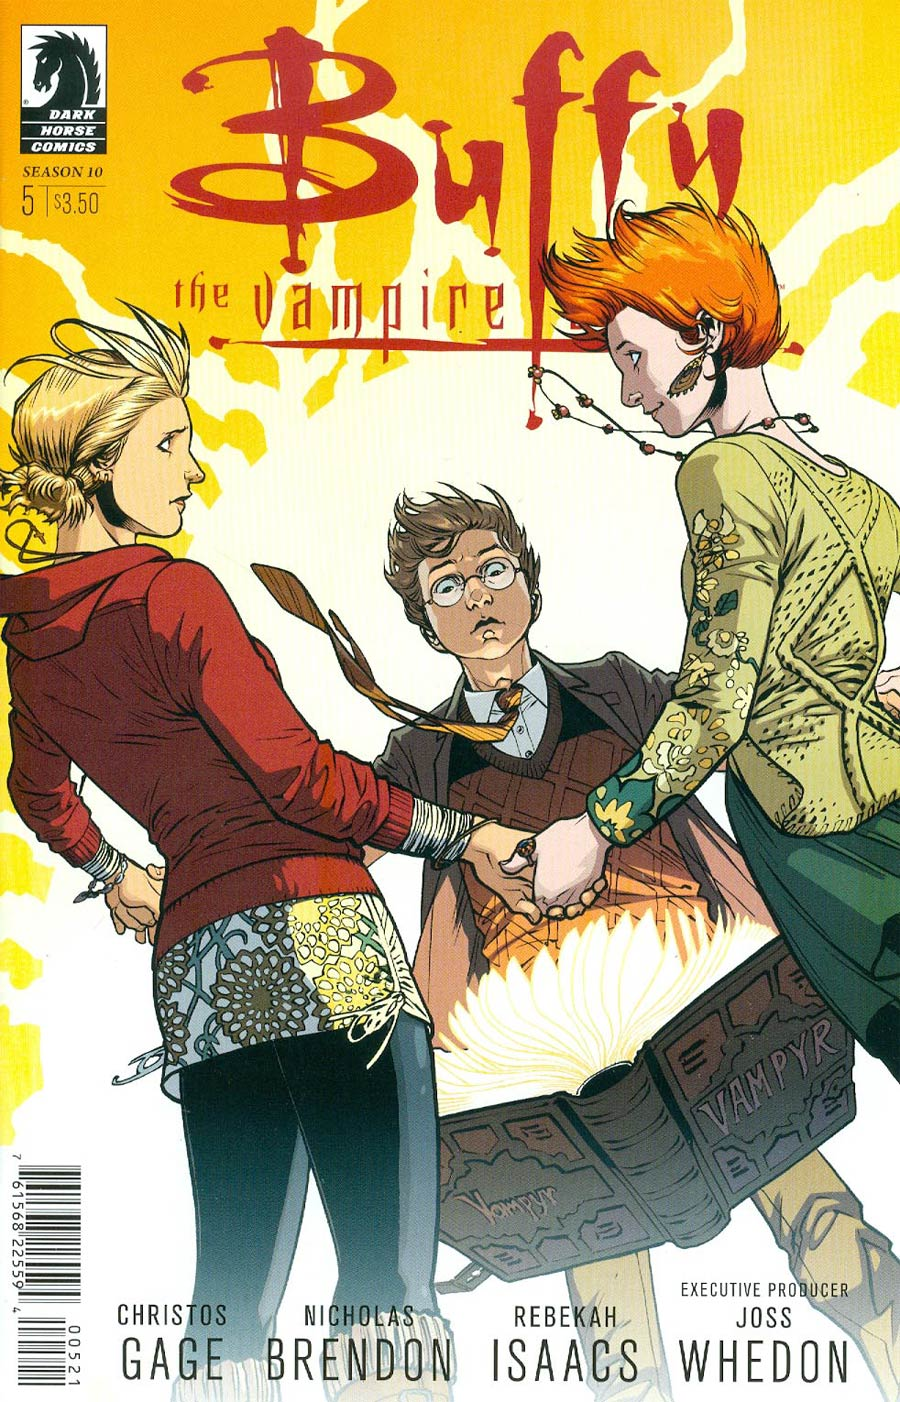 Buffy The Vampire Slayer Season 10 #5 Cover B Variant Rebekah Isaacs Cover